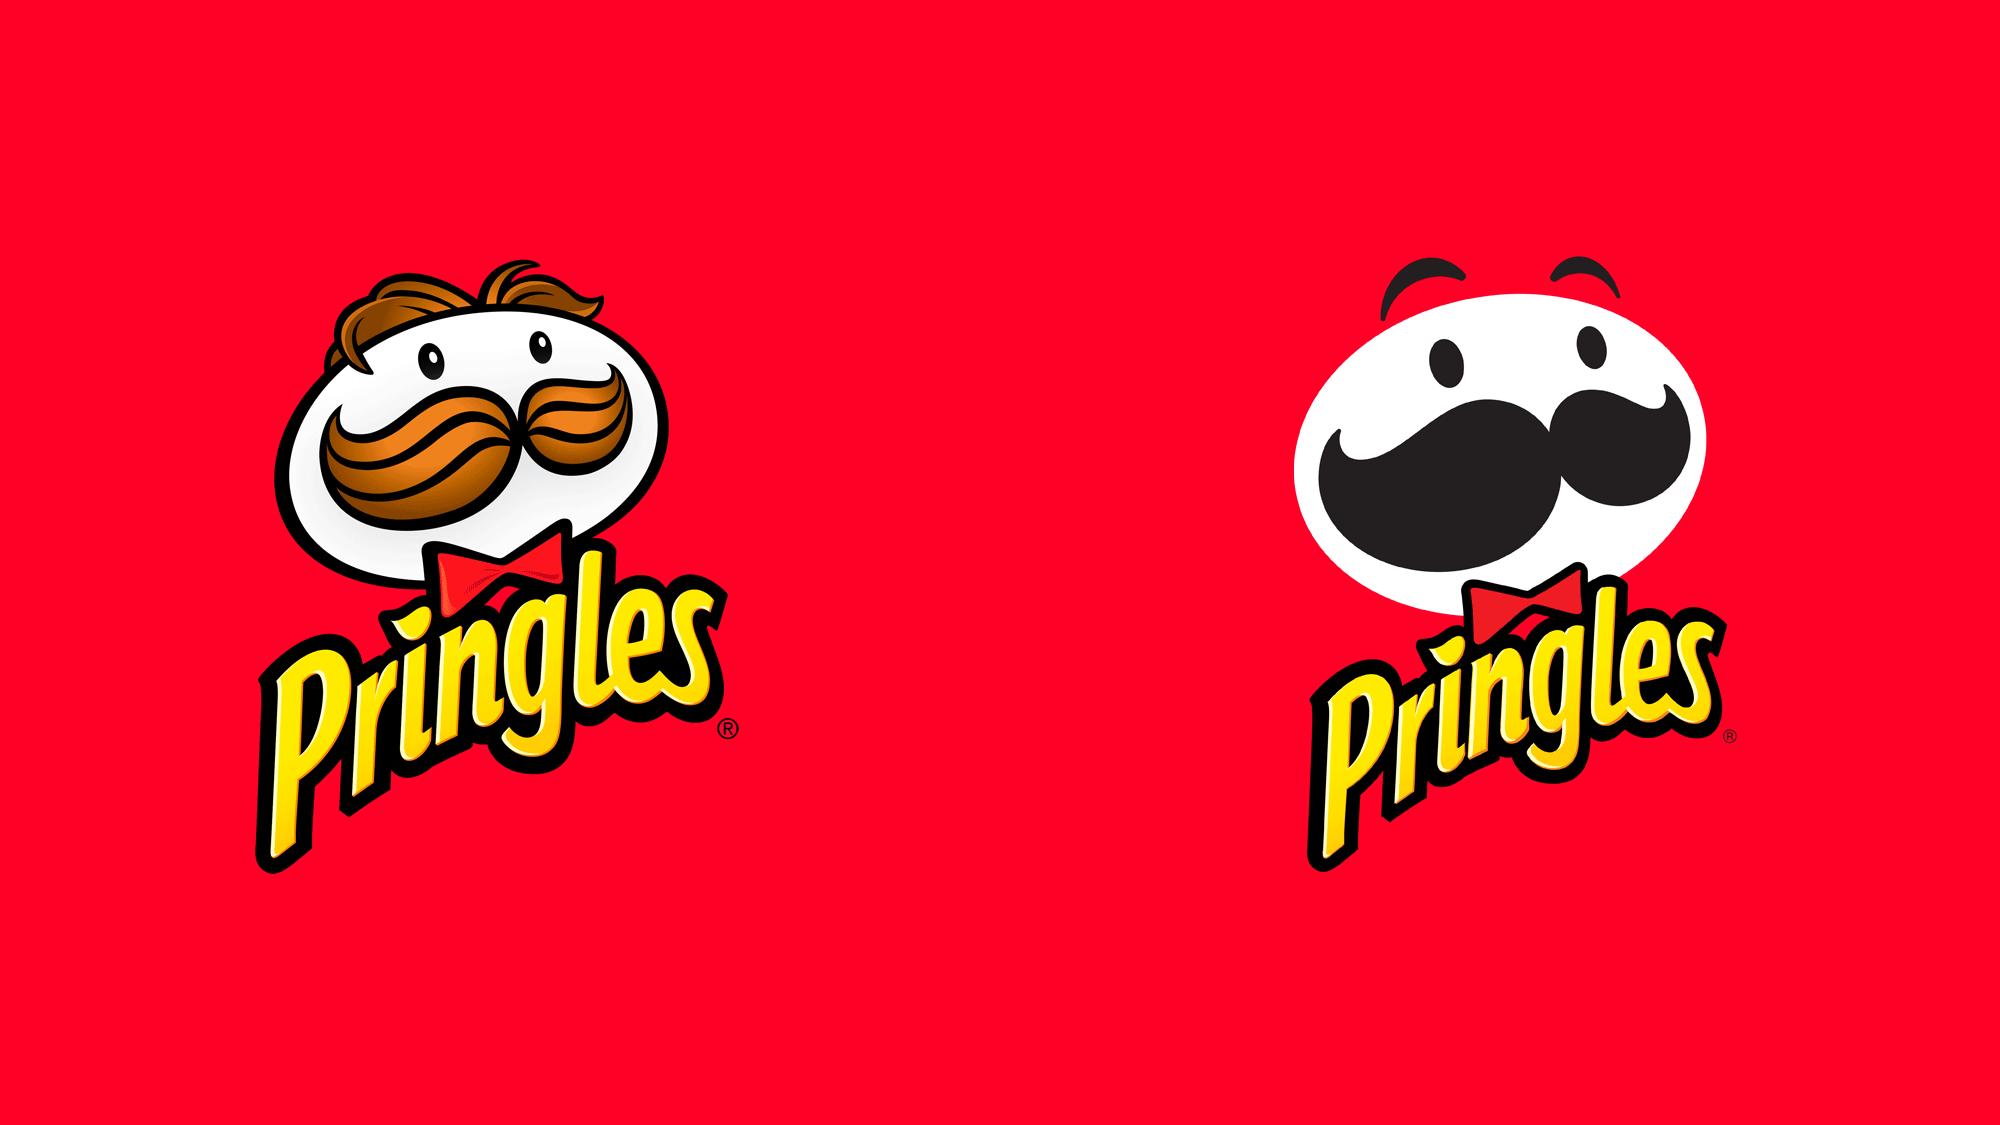 Pringles - Jeanzilla - Gianluca De Bianchi